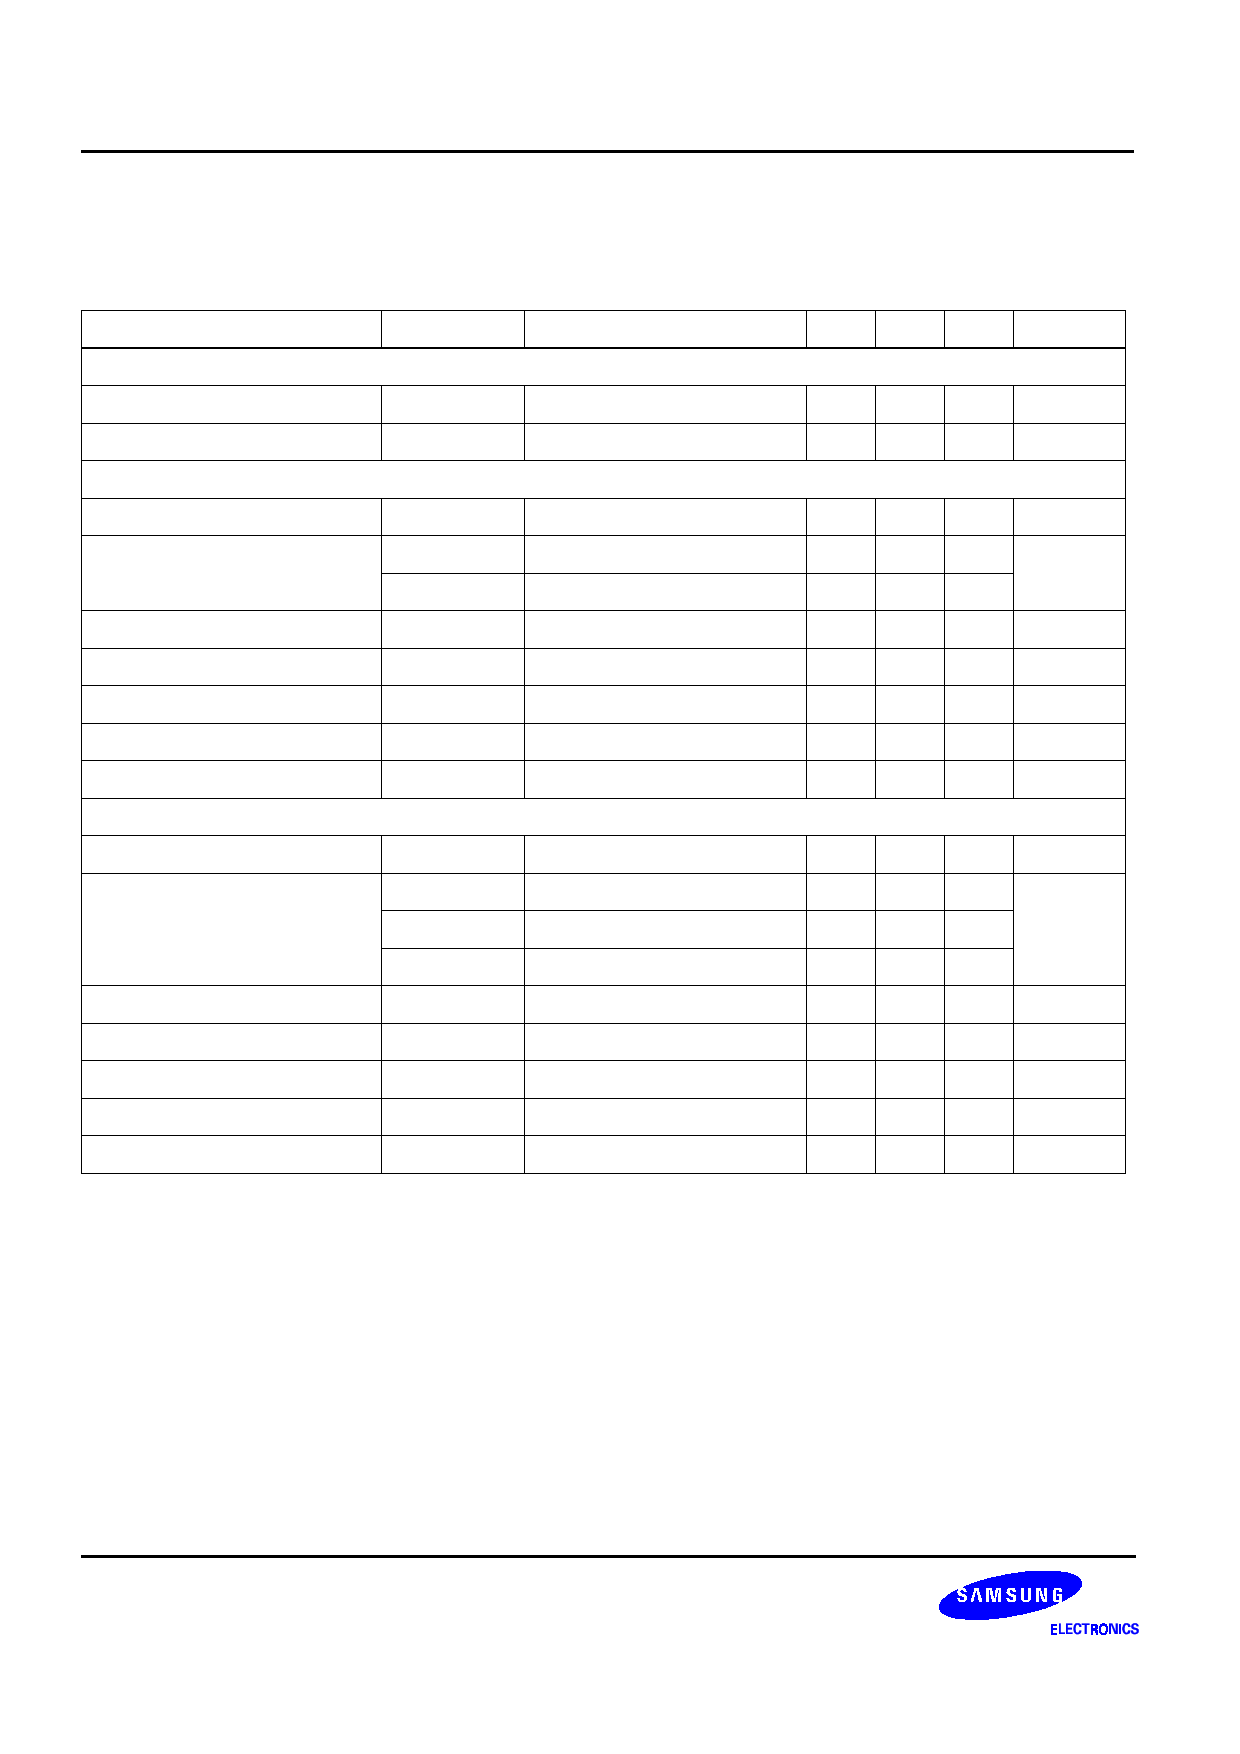 S1T8507C01-S0B0 pdf, 반도체, 판매, 대치품